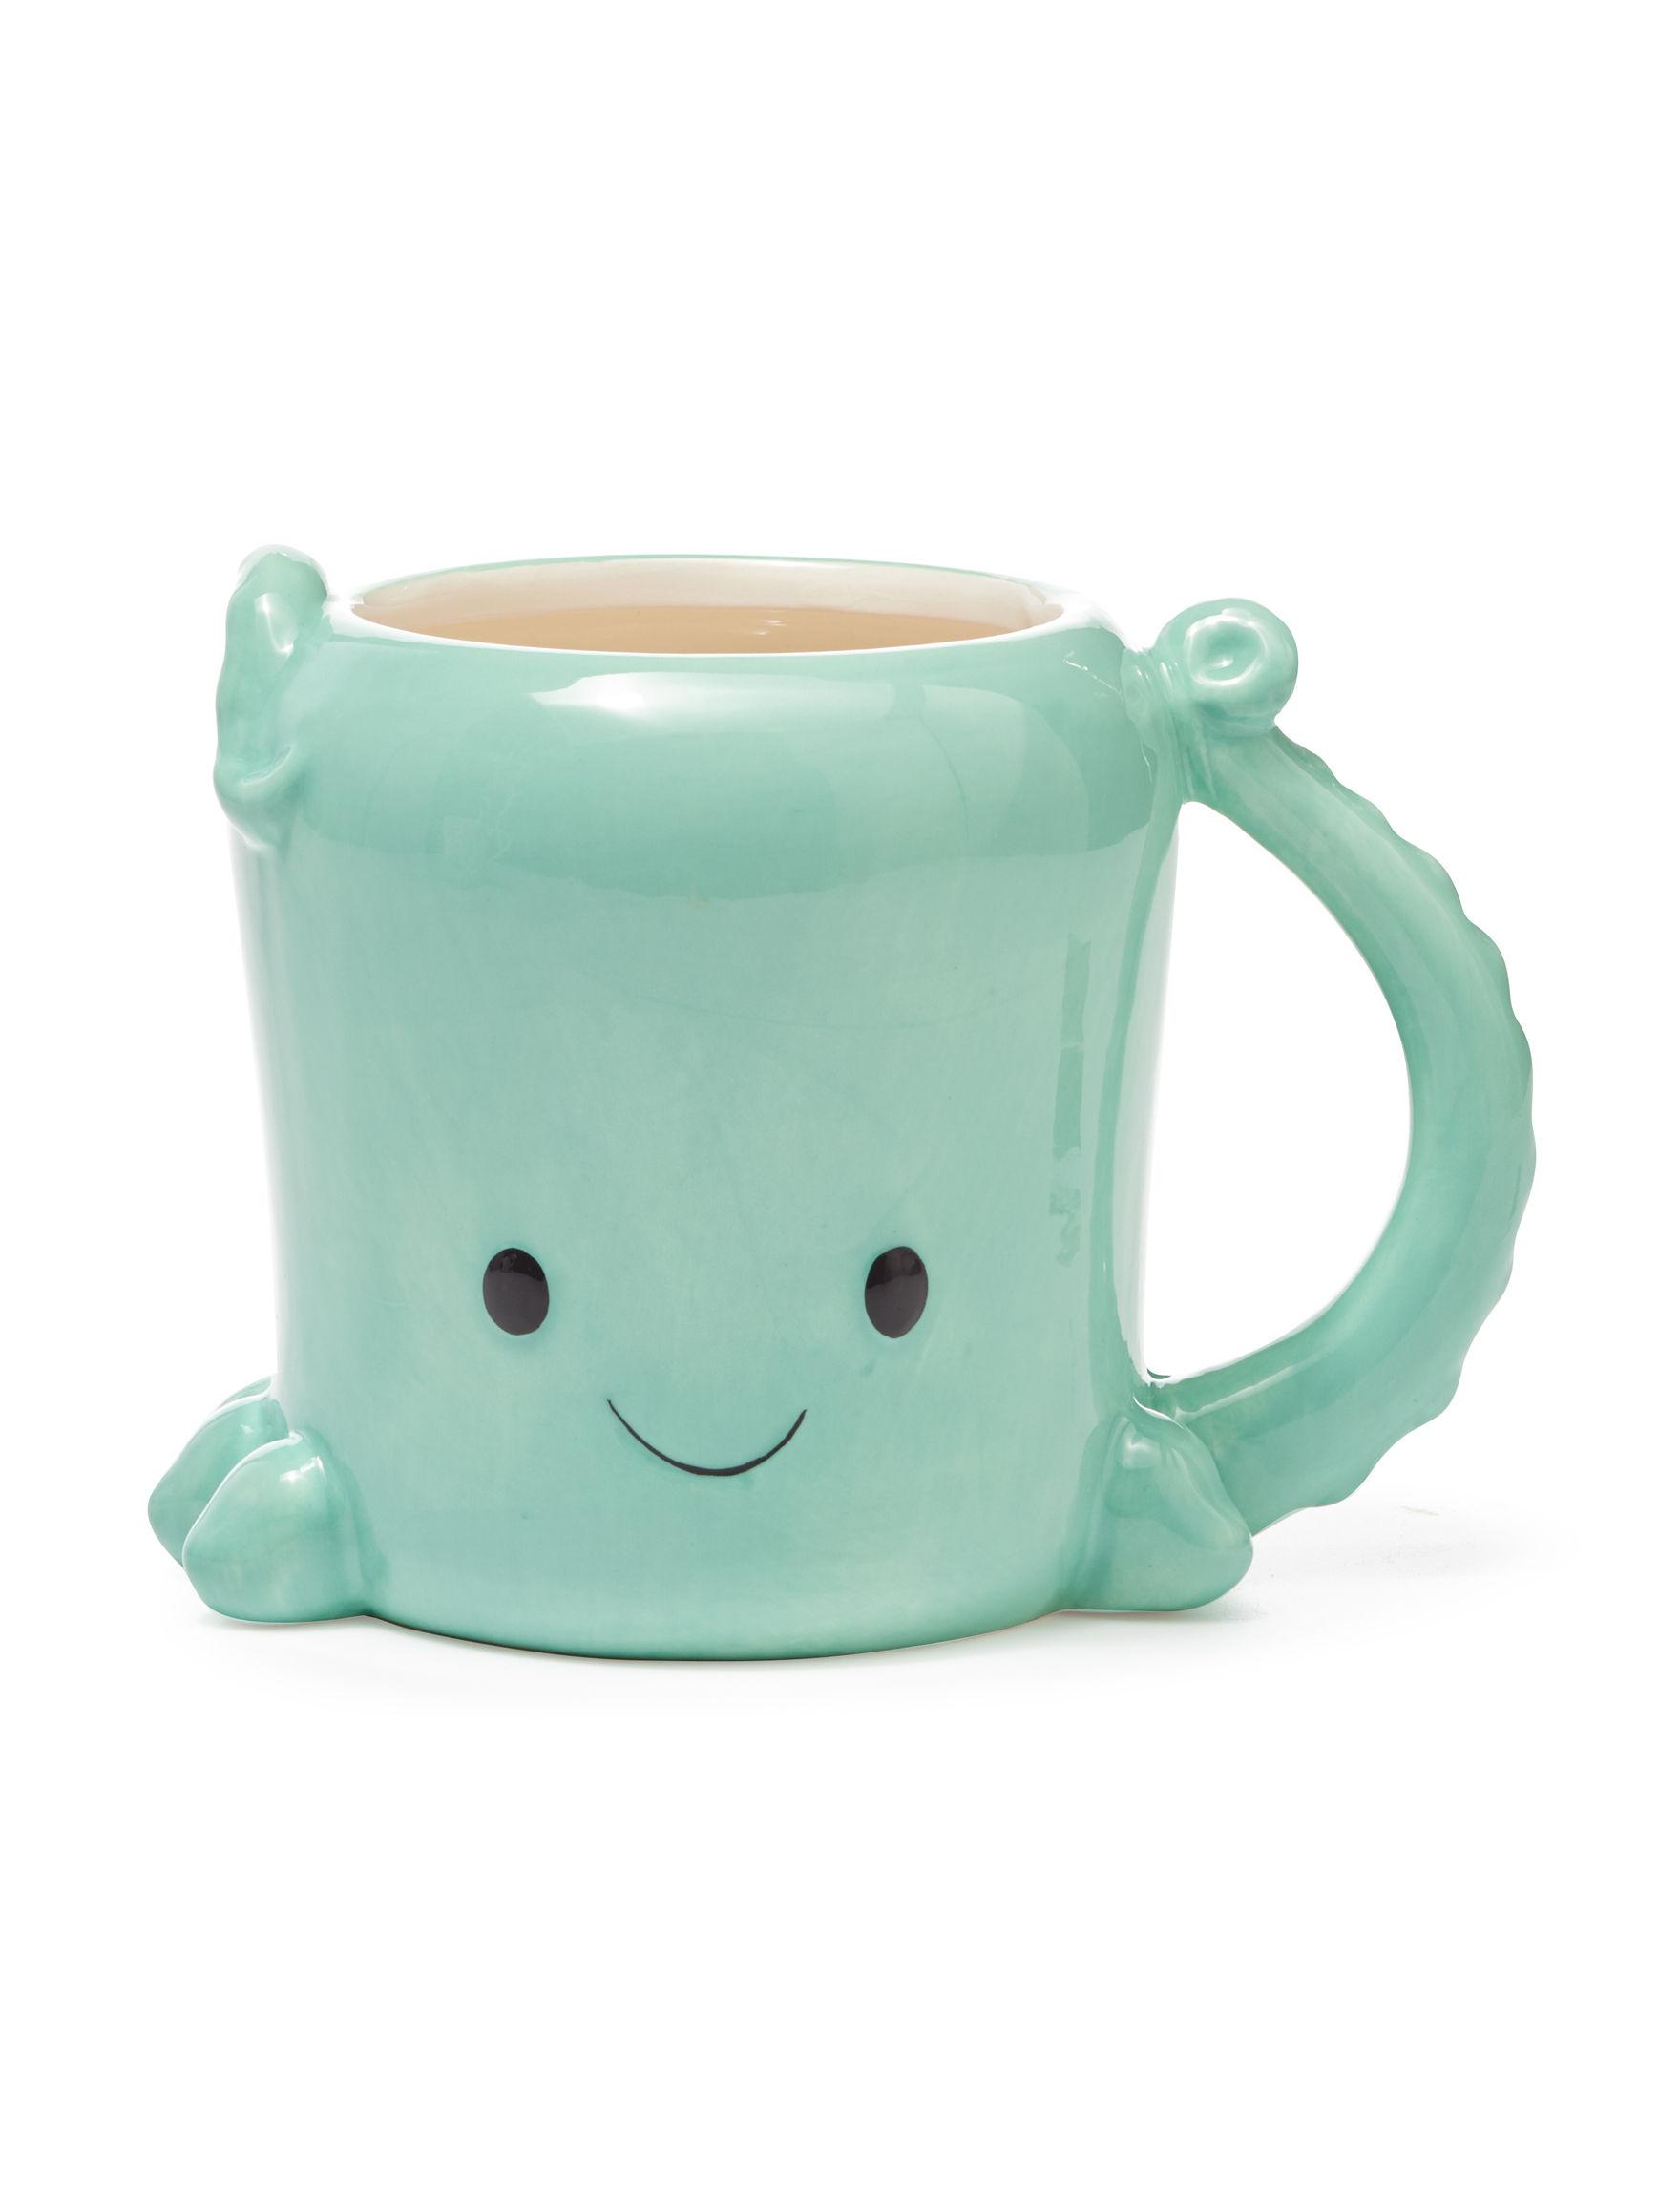 Enchante Blue Mugs Drinkware